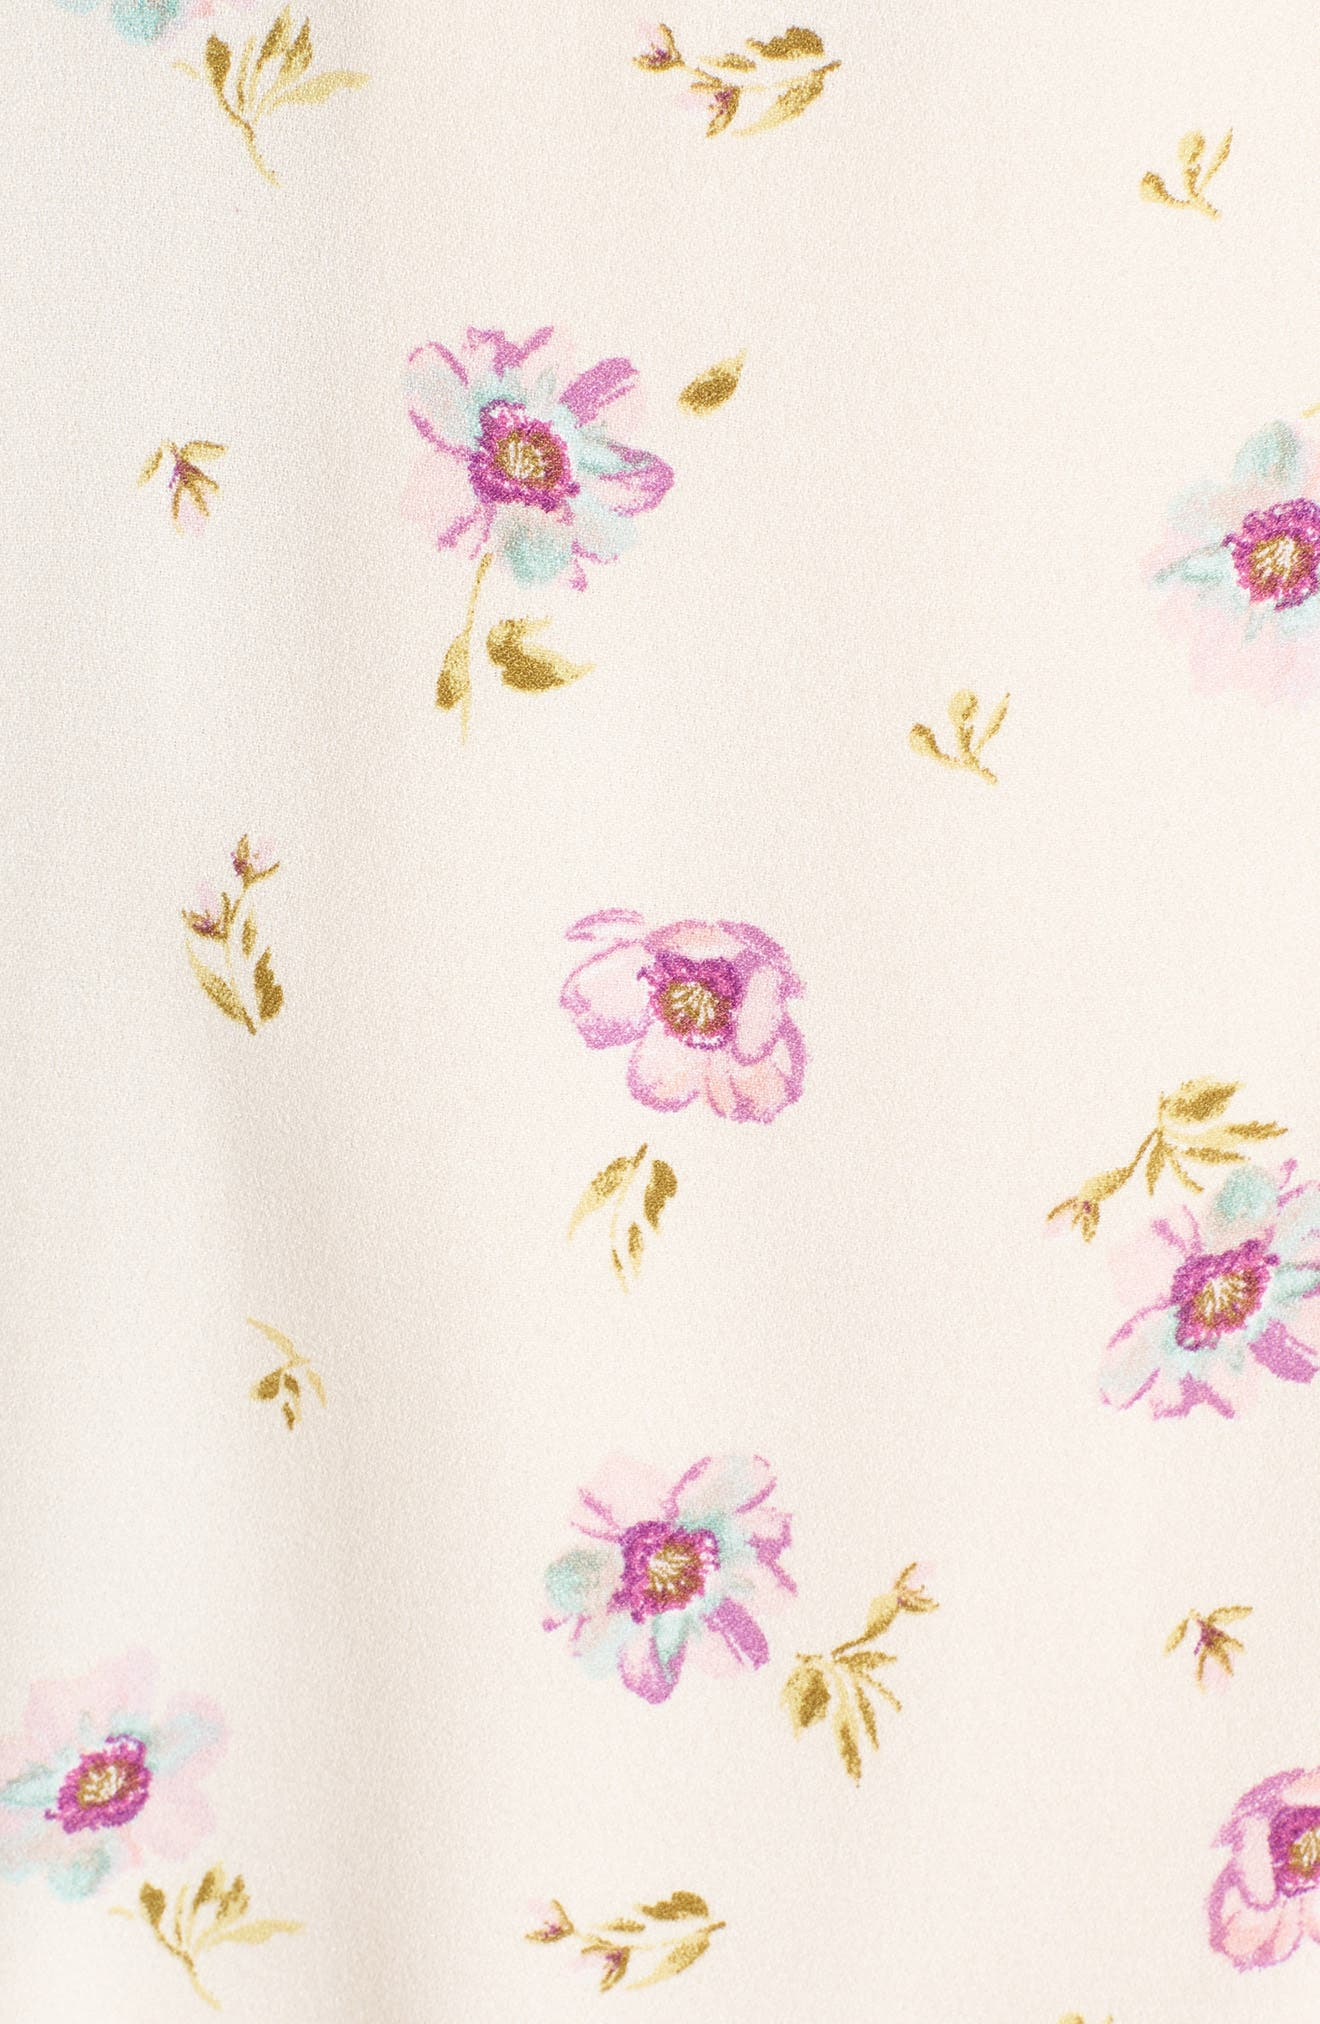 Rosa Wrap Maxi Dress,                             Alternate thumbnail 6, color,                             Lilac Floral